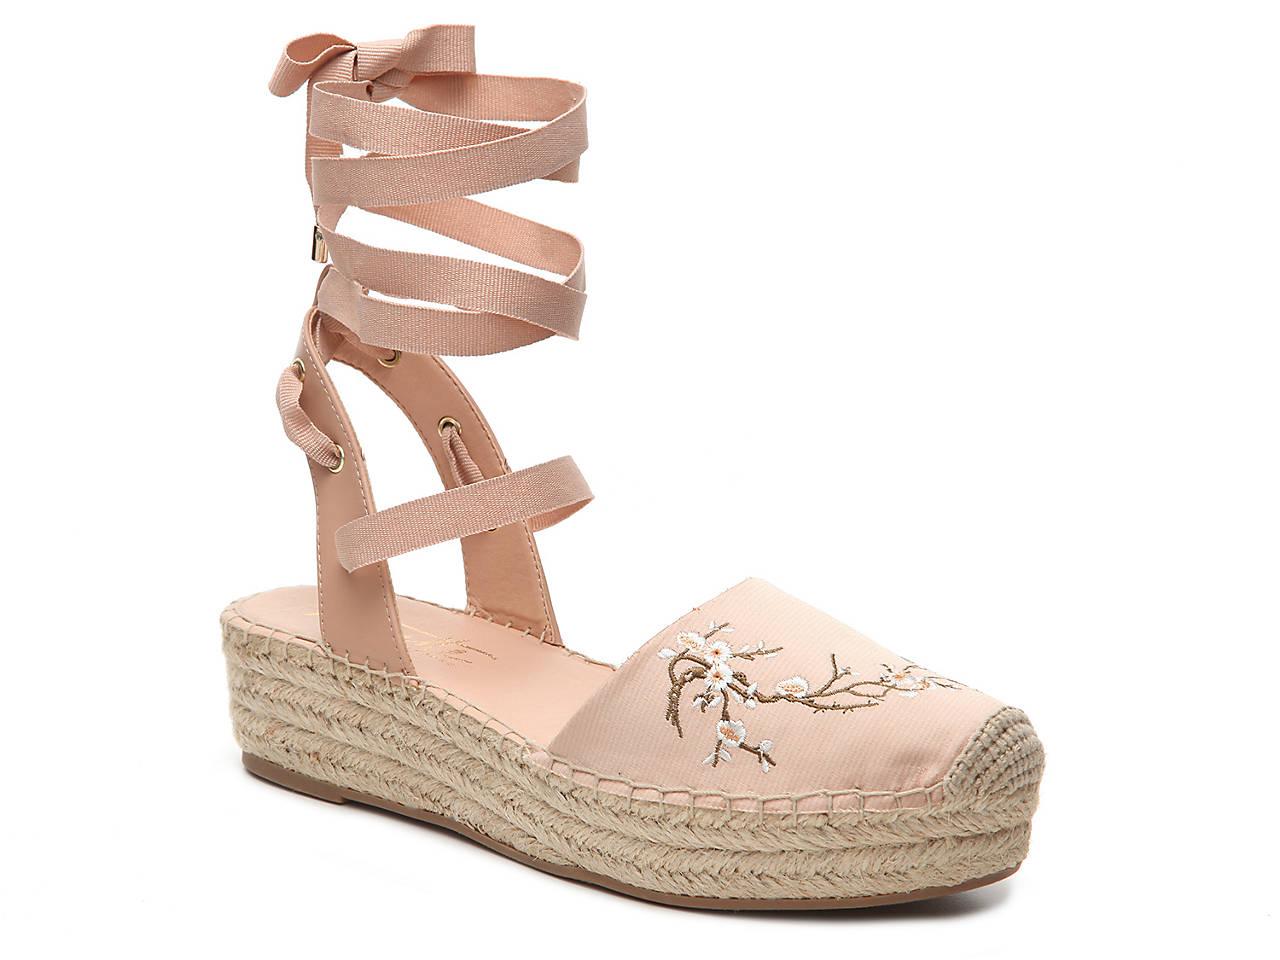 78b35f4c5d8 Nanette Nanette Lepore Beatriz Espadrille Sandal Women s Shoes